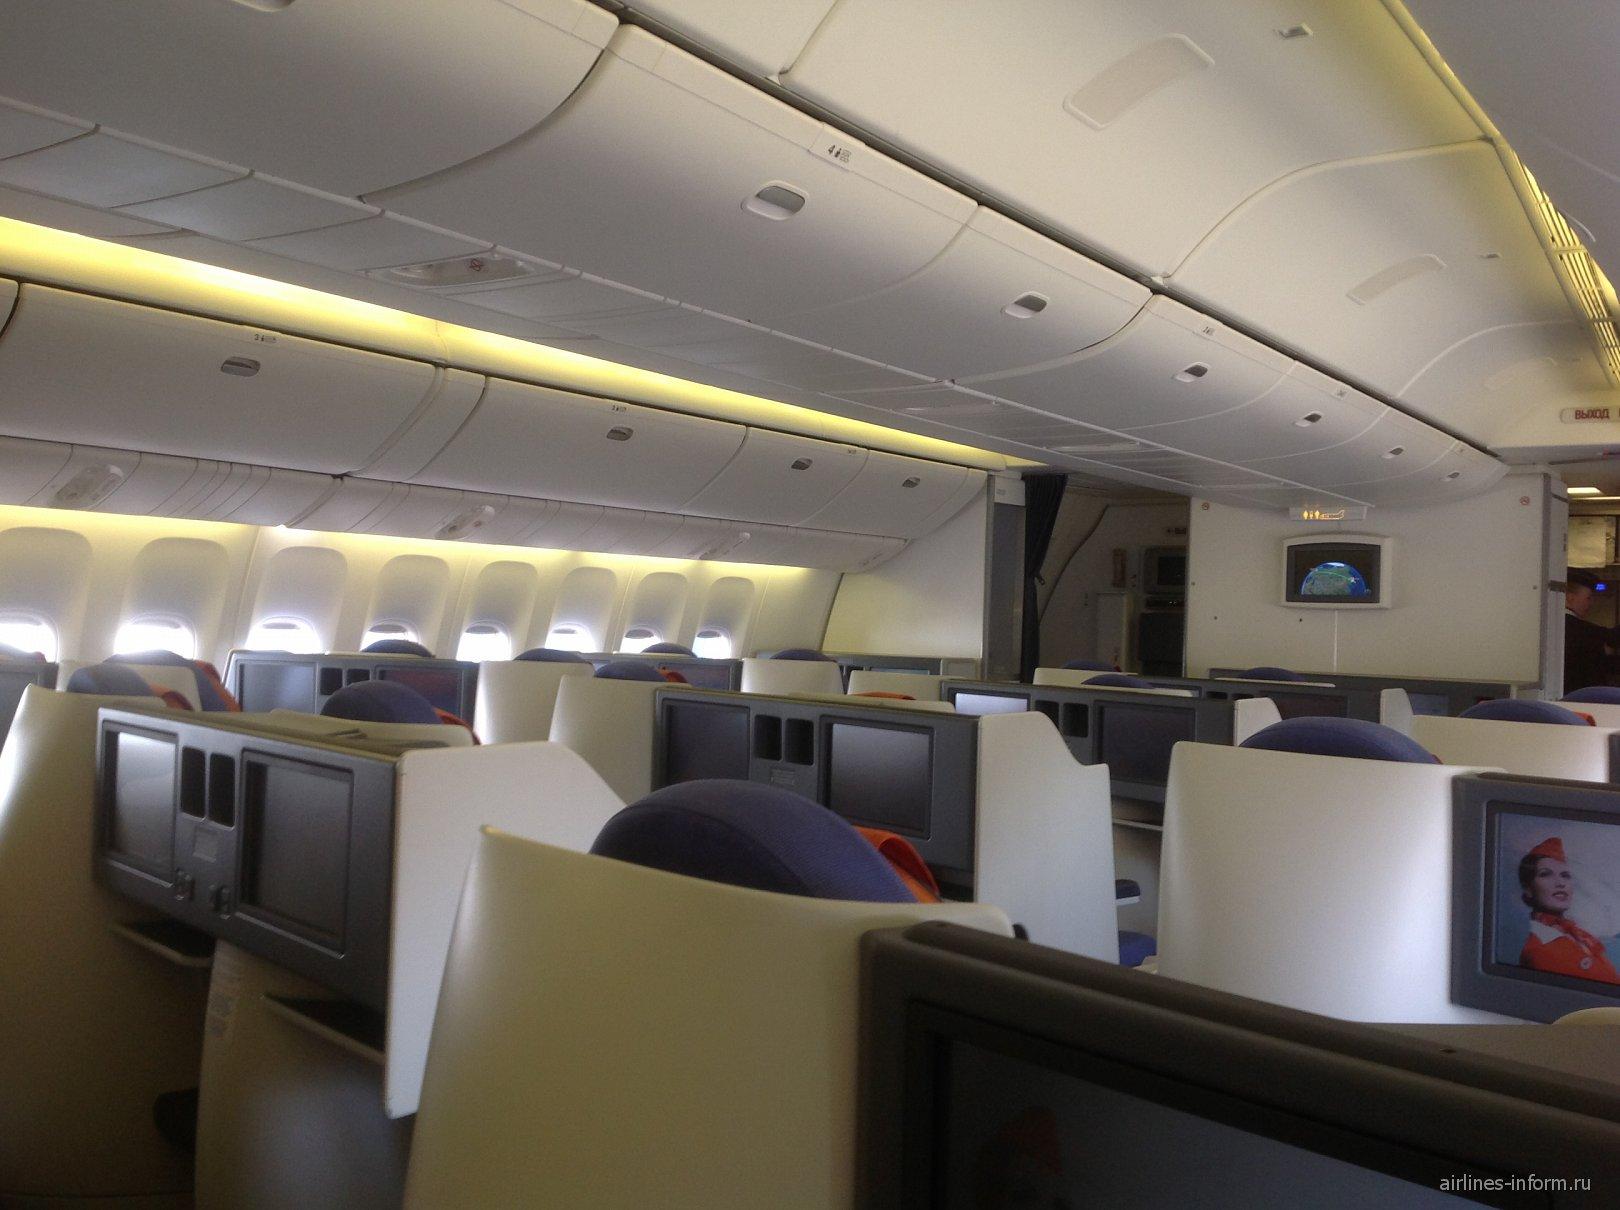 Салон бизнес-класса в самолете Боинг-777-300 Аэрофлота